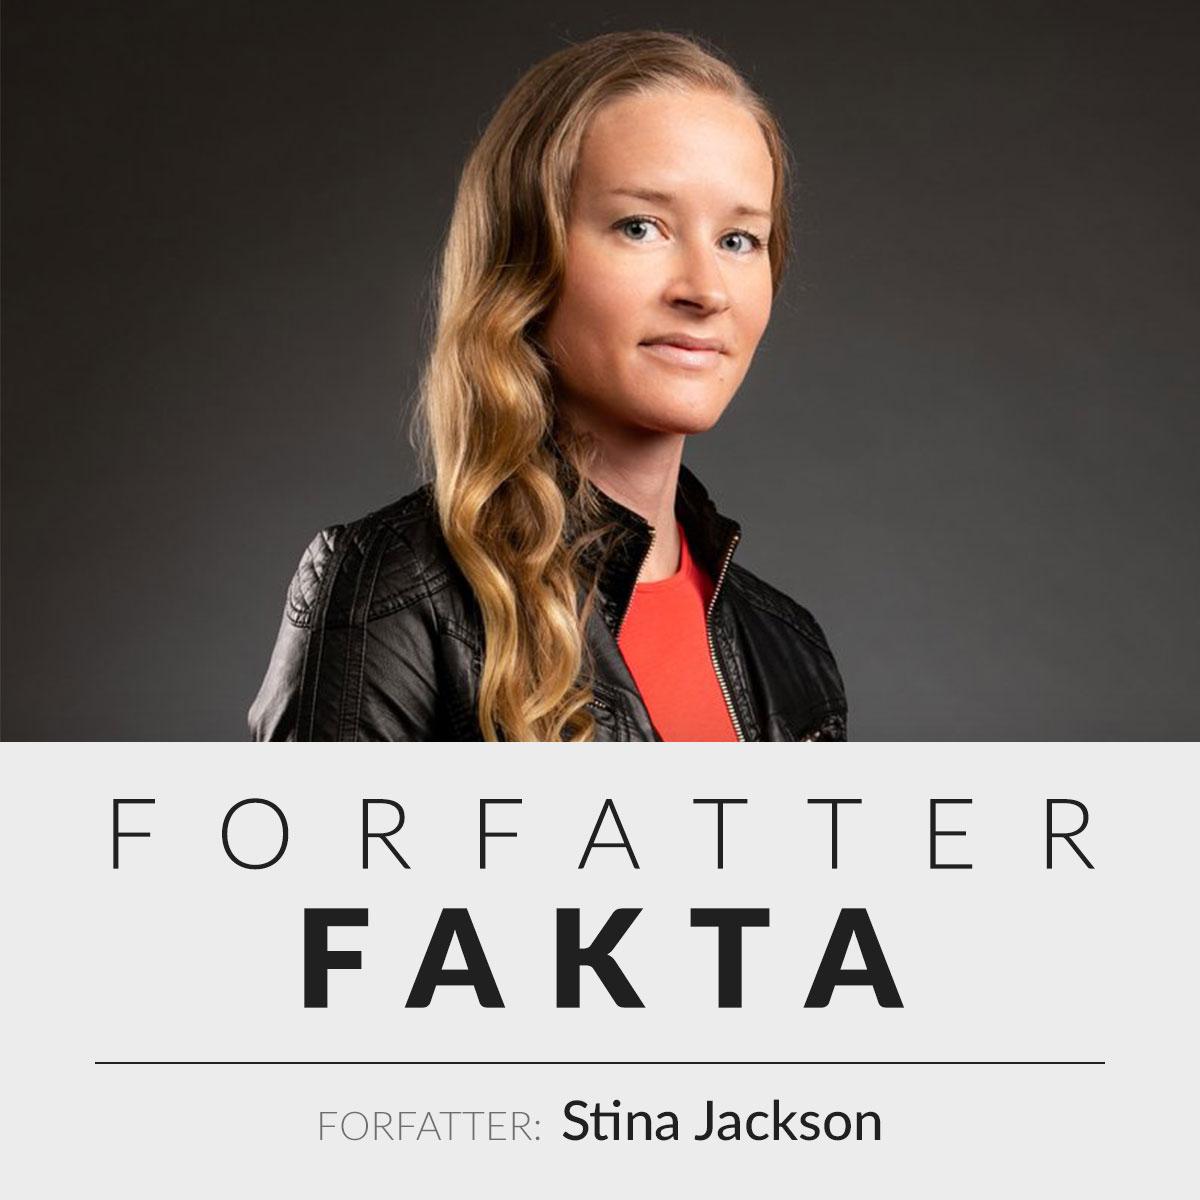 Stina Jackson